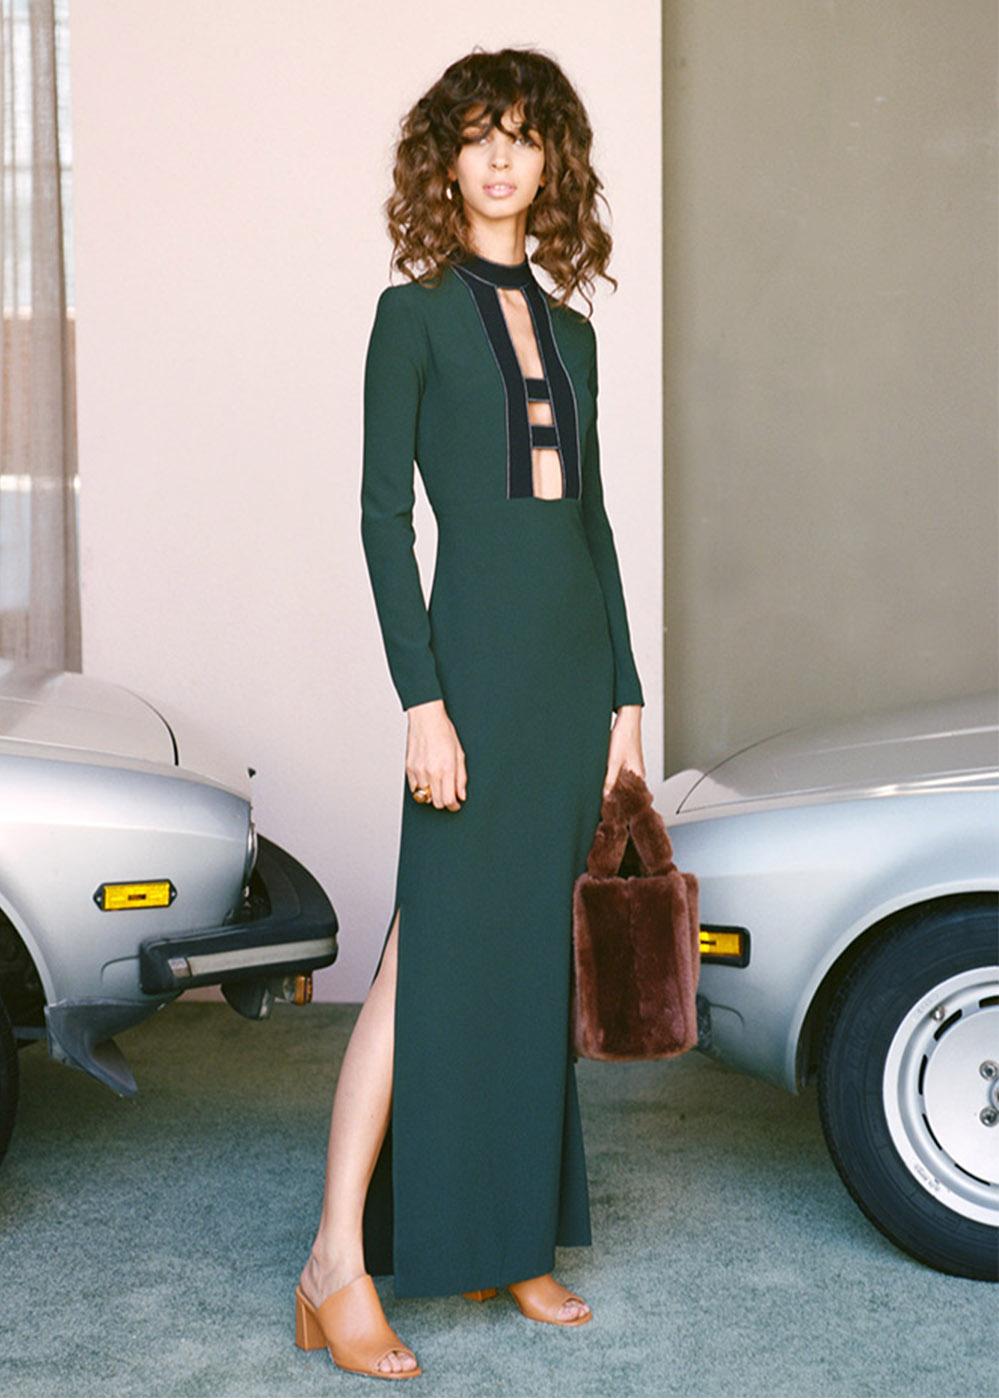 Staud 'Myo' dress in Dark Green,  $255